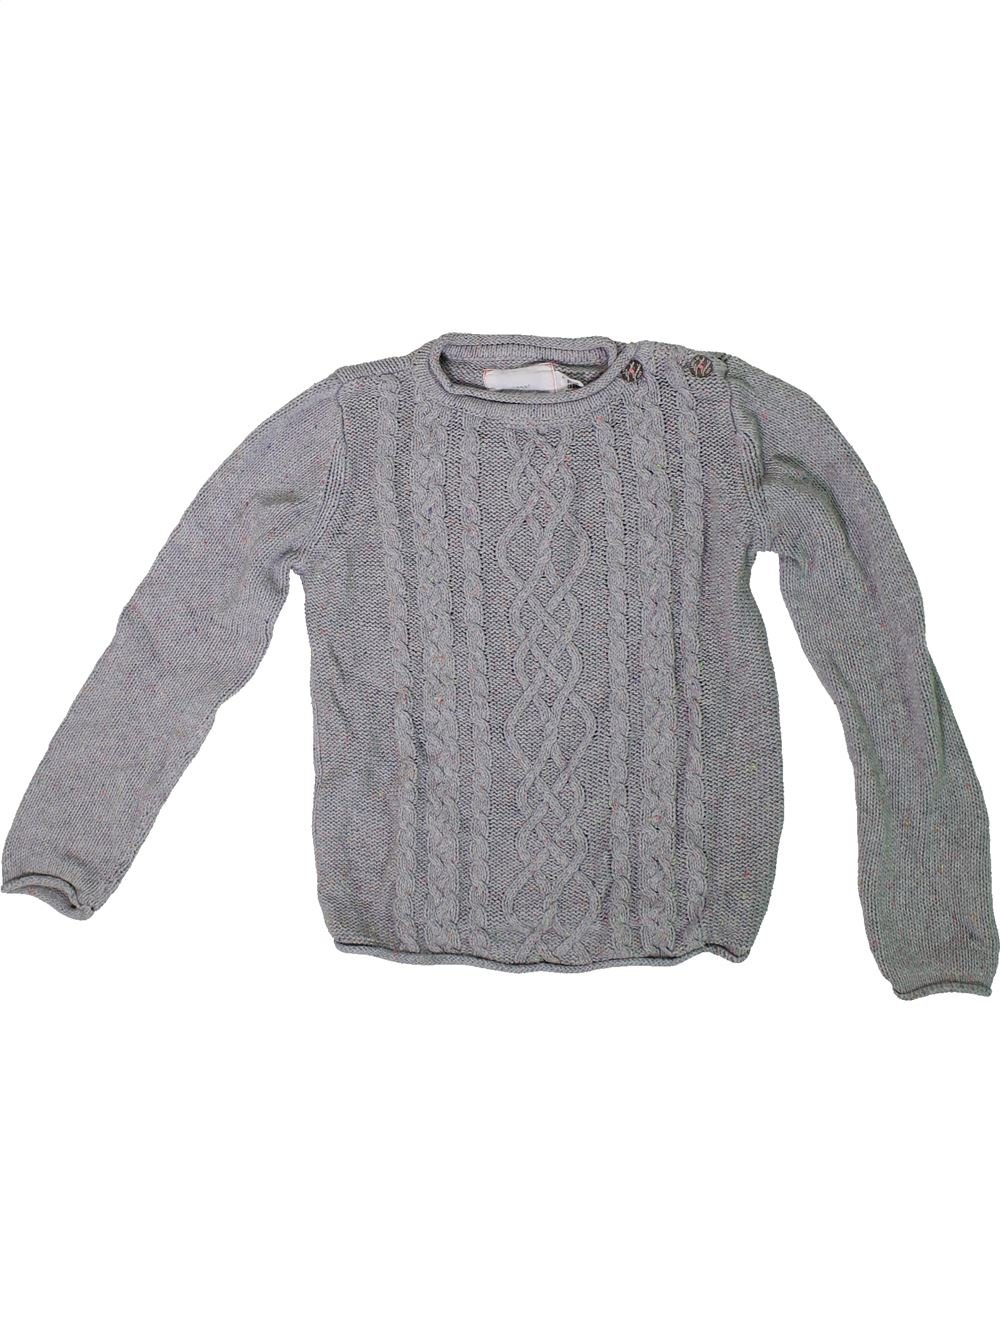 dessins attrayants acheter amazon Pull Fille H&M 8 ans pas cher, 3.00 € - #1307990